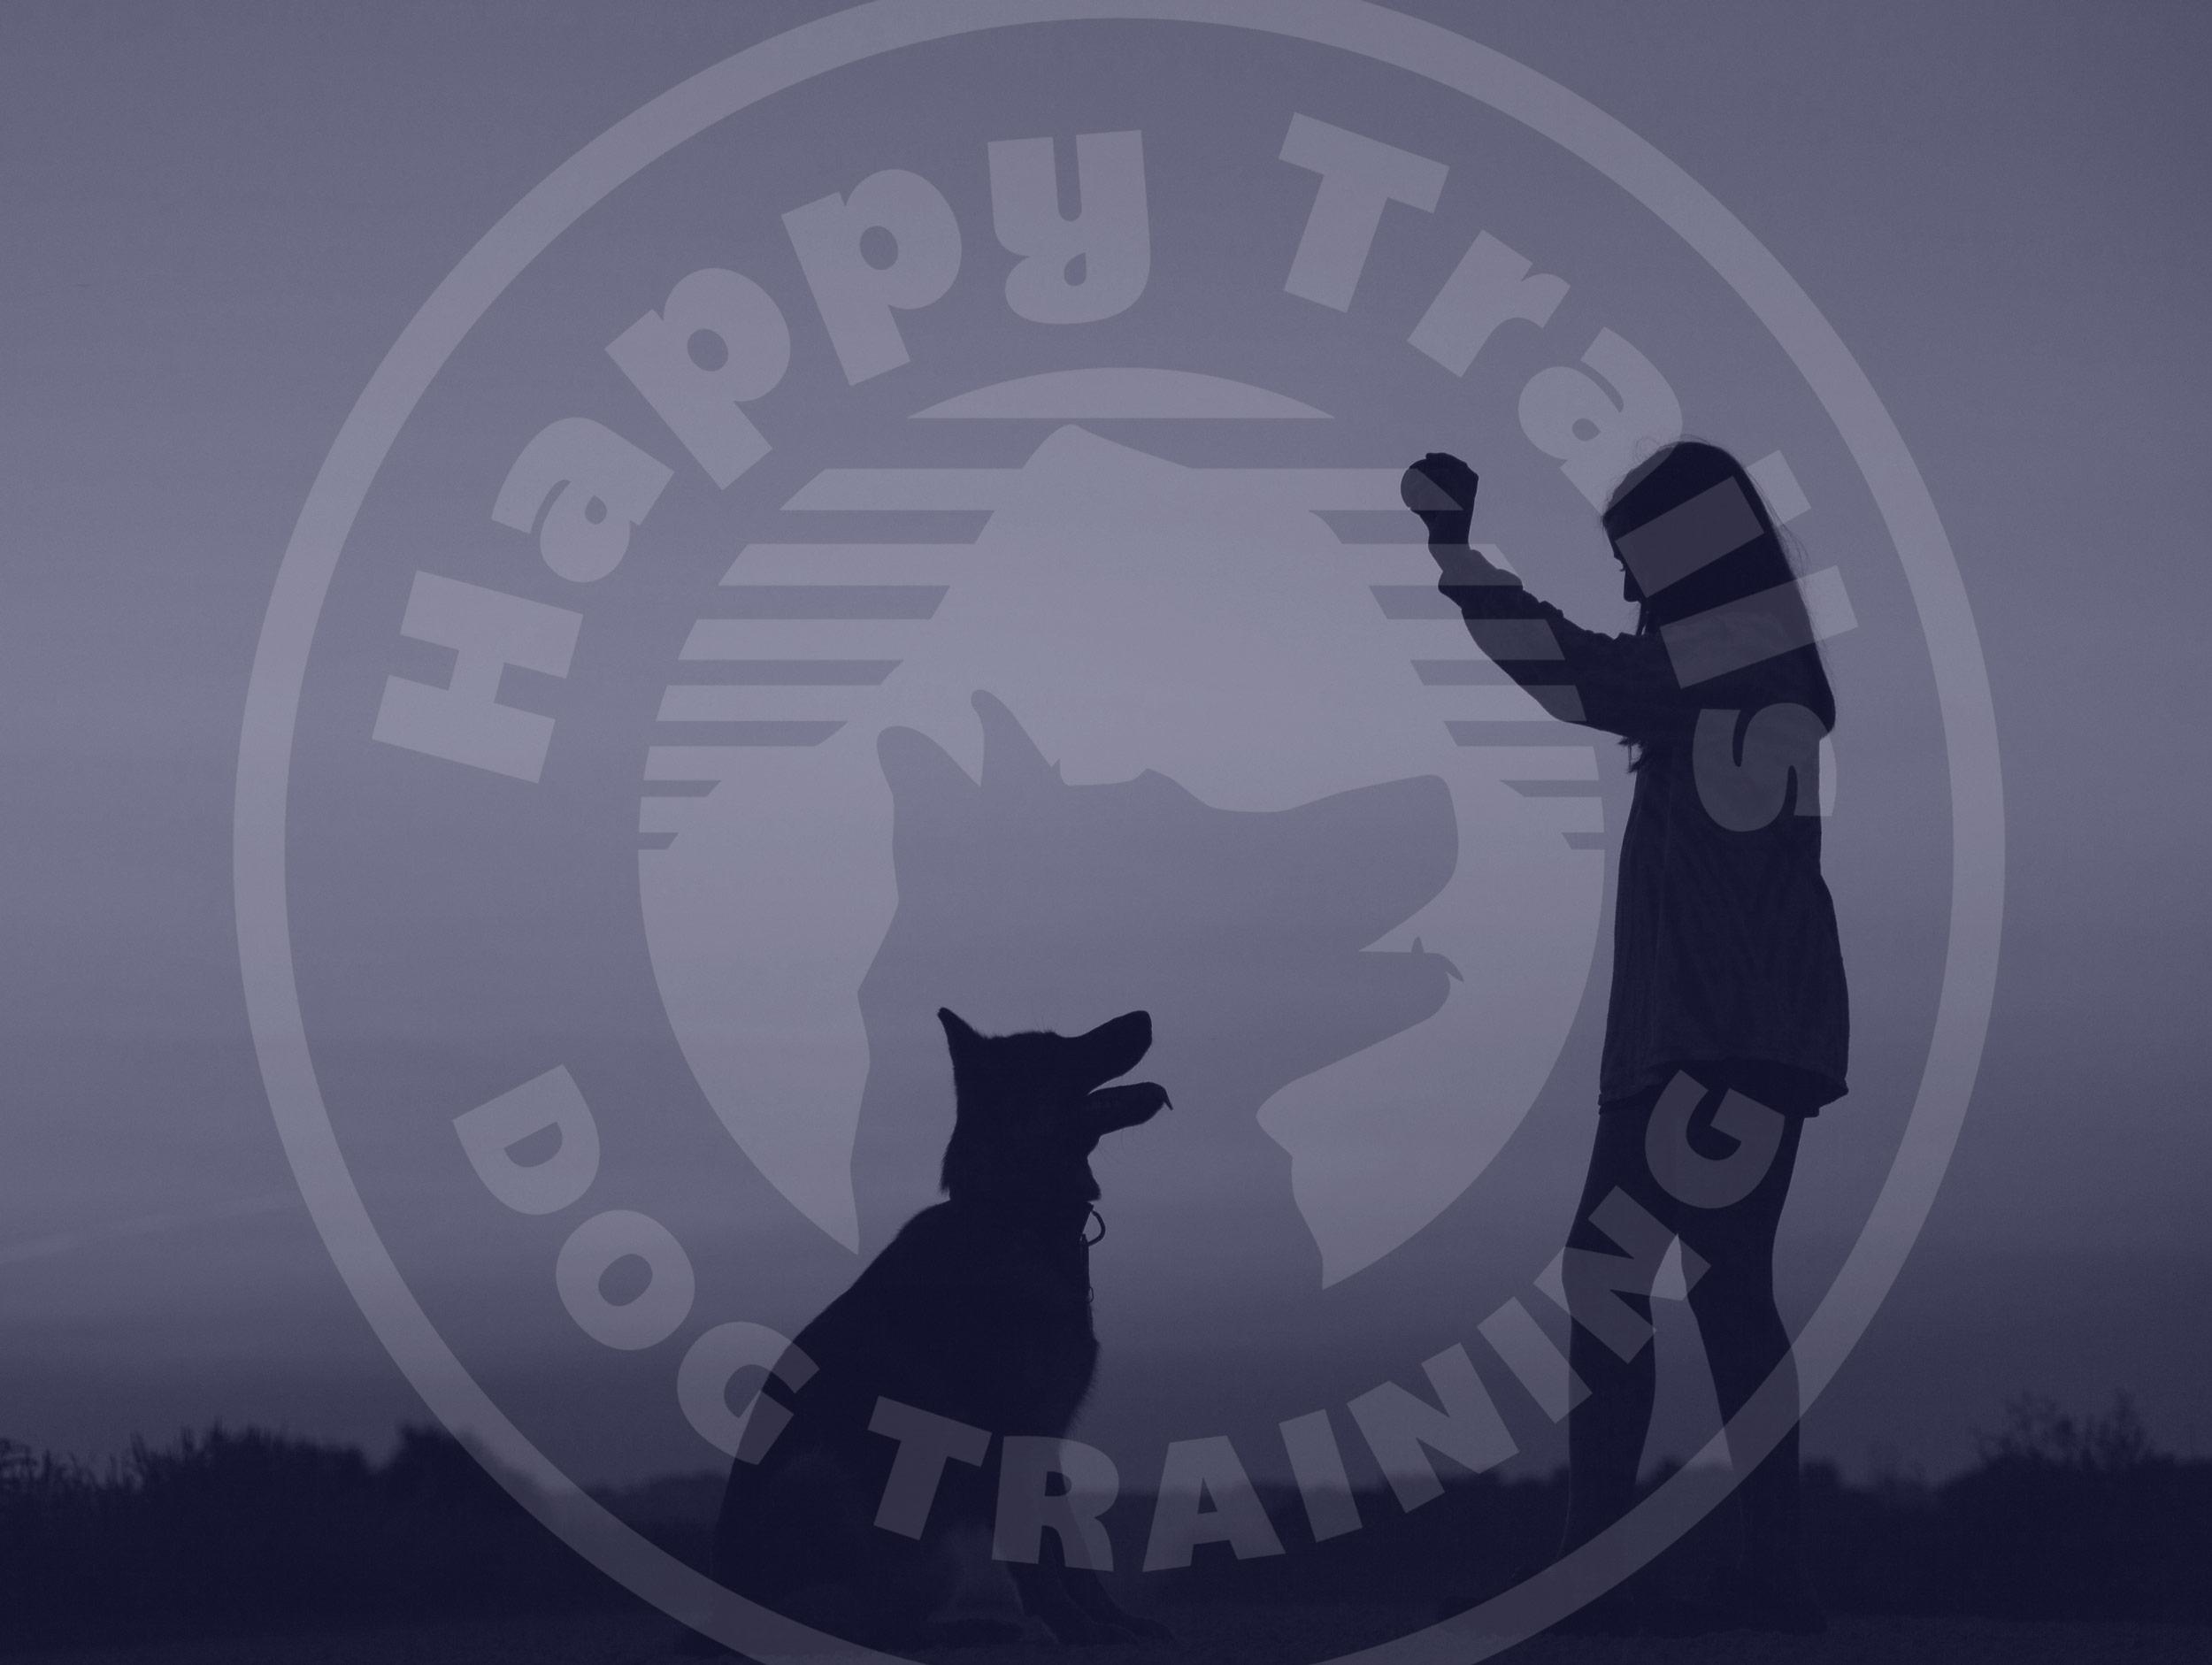 happy trails dog trainer logo design by mike hosier